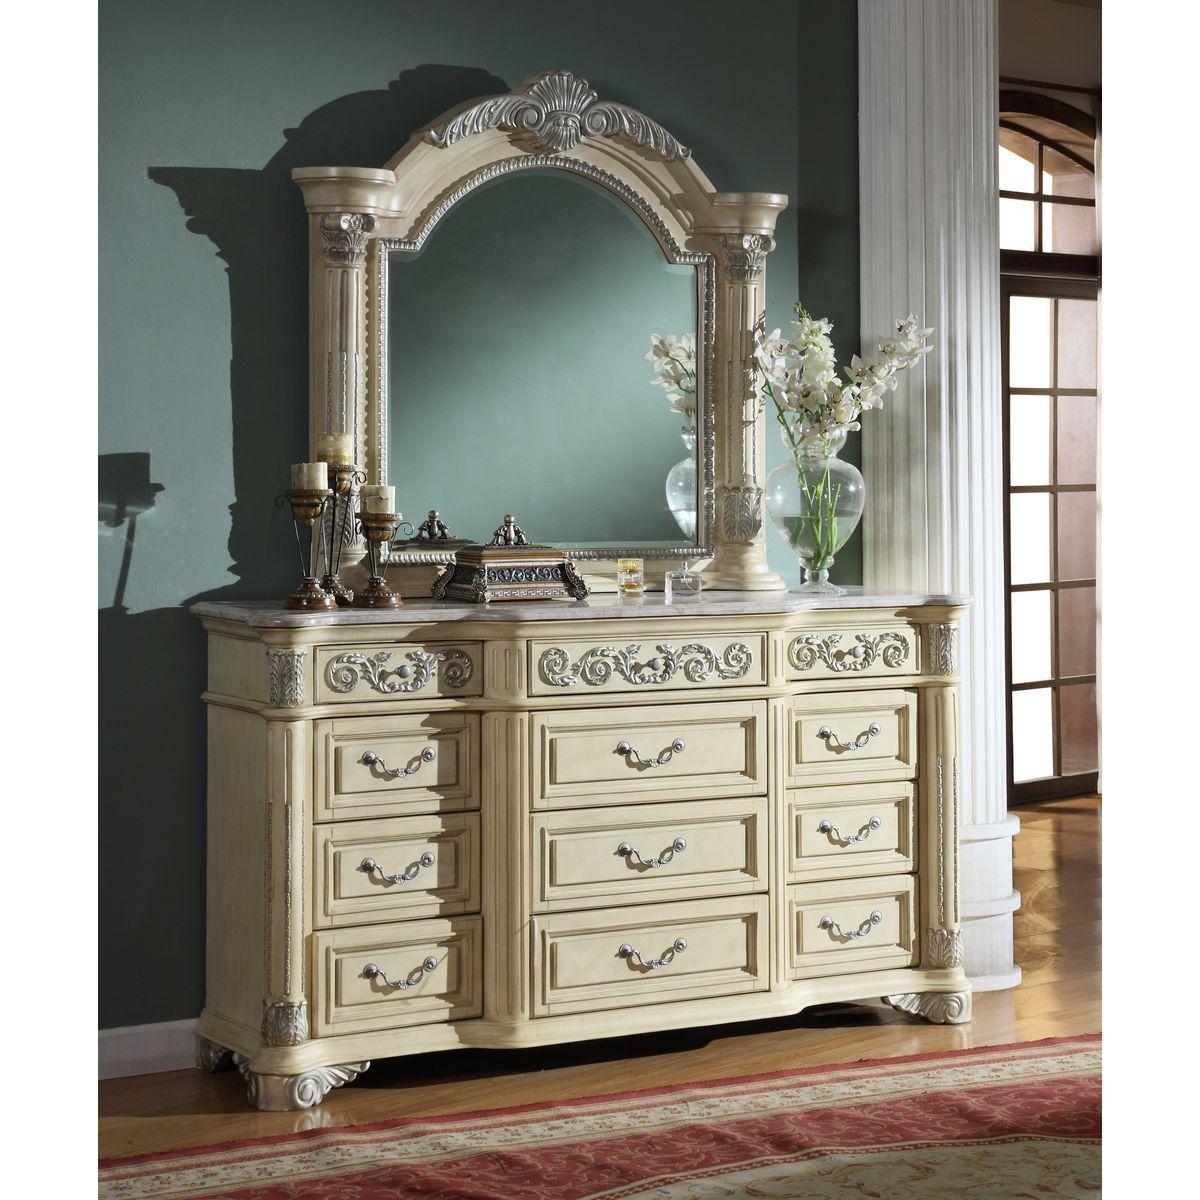 Meridian Furniture Sienna D Sienna Antique White Dresser W/ Ornate Carvings  U0026 Marble Top